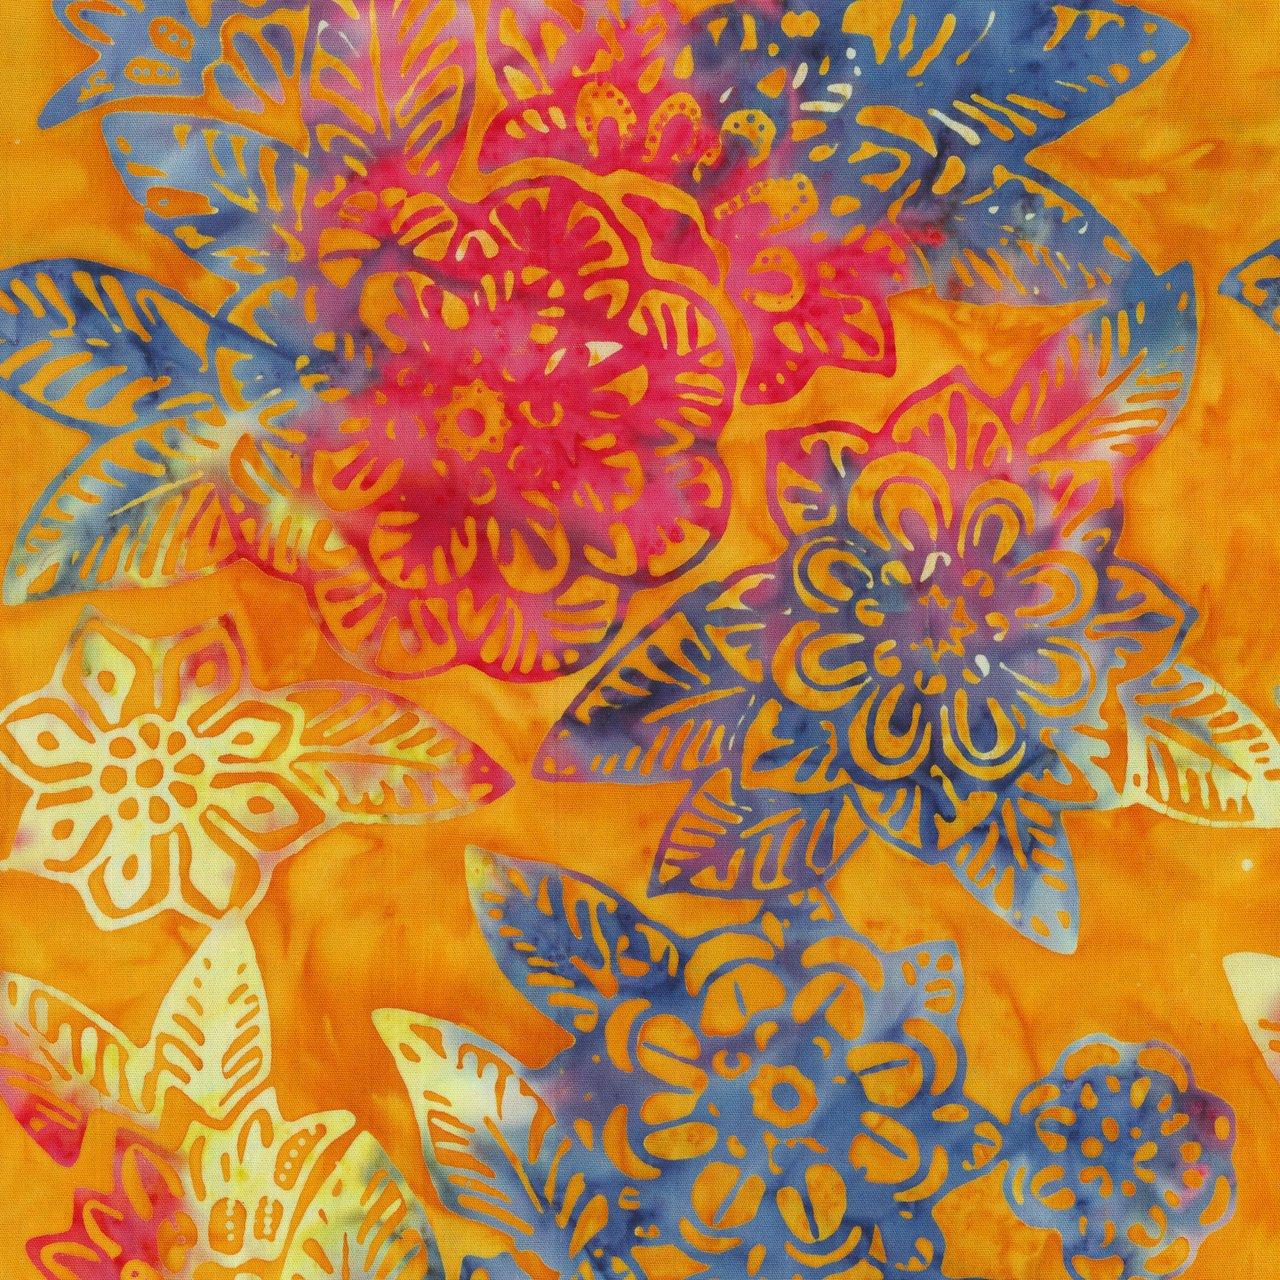 2020Q-2 Art Inspired: Northern Blooms by Erin Hanson